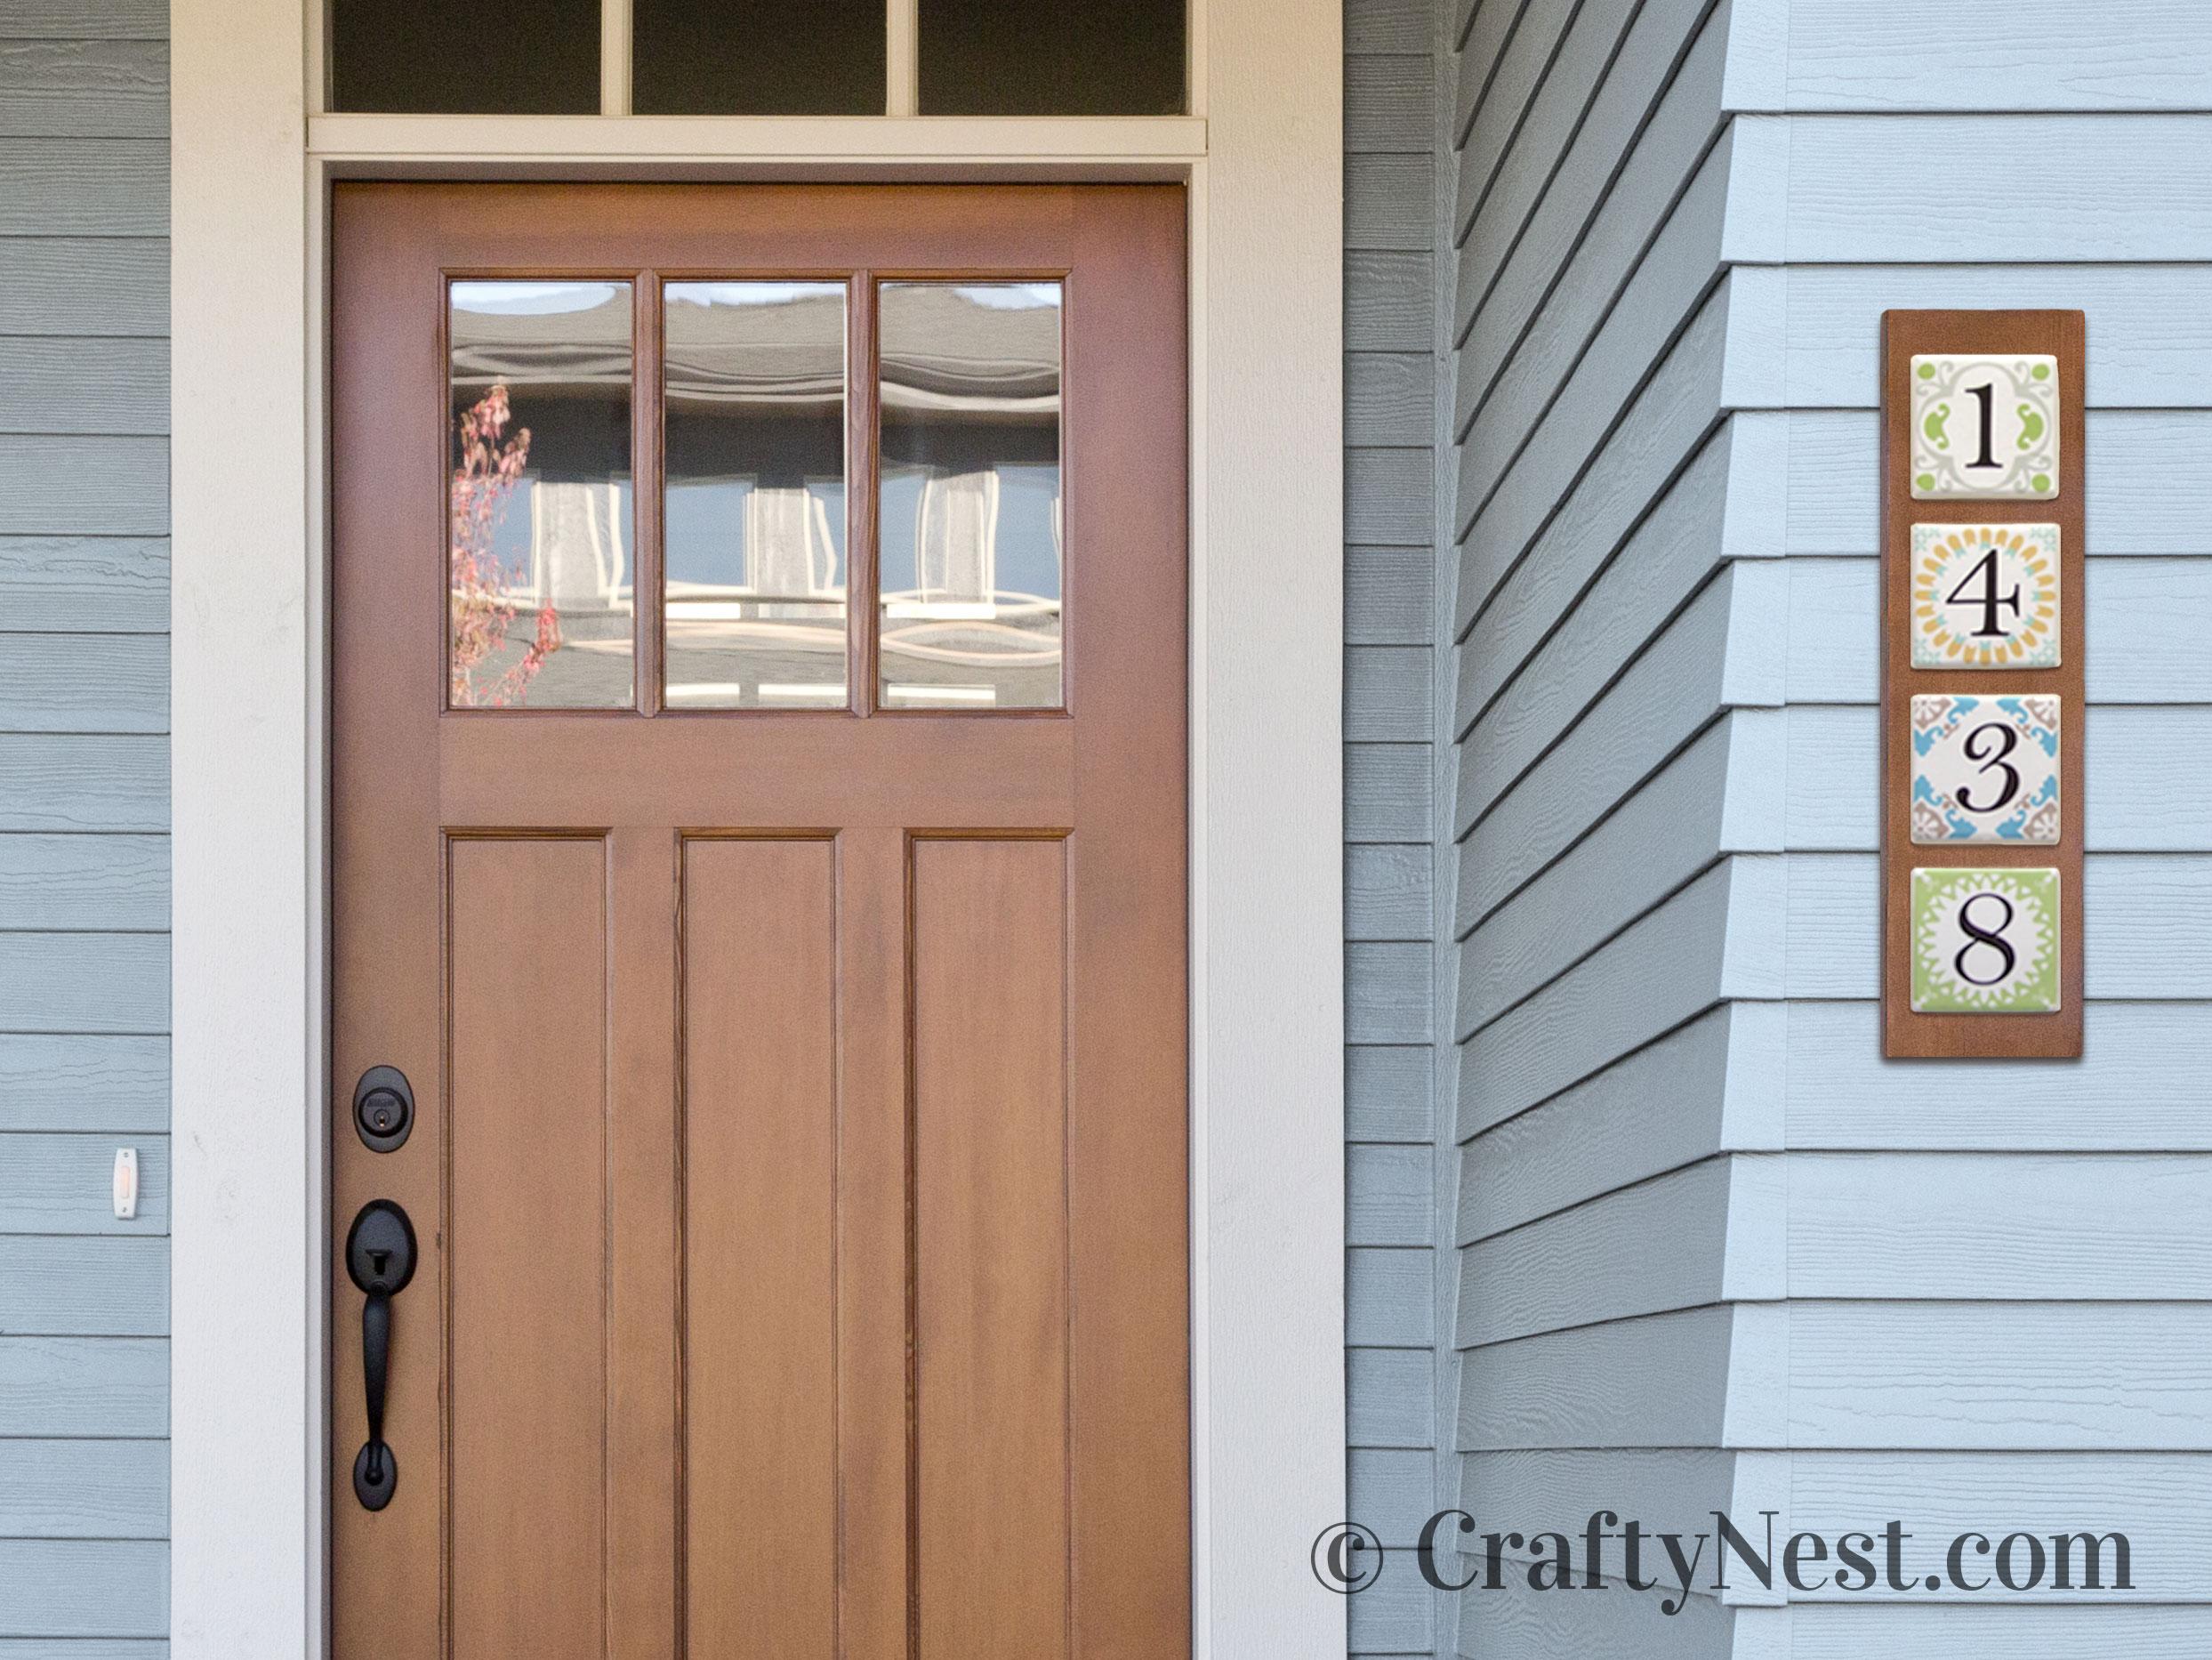 Homemade house numbers on a house, photo